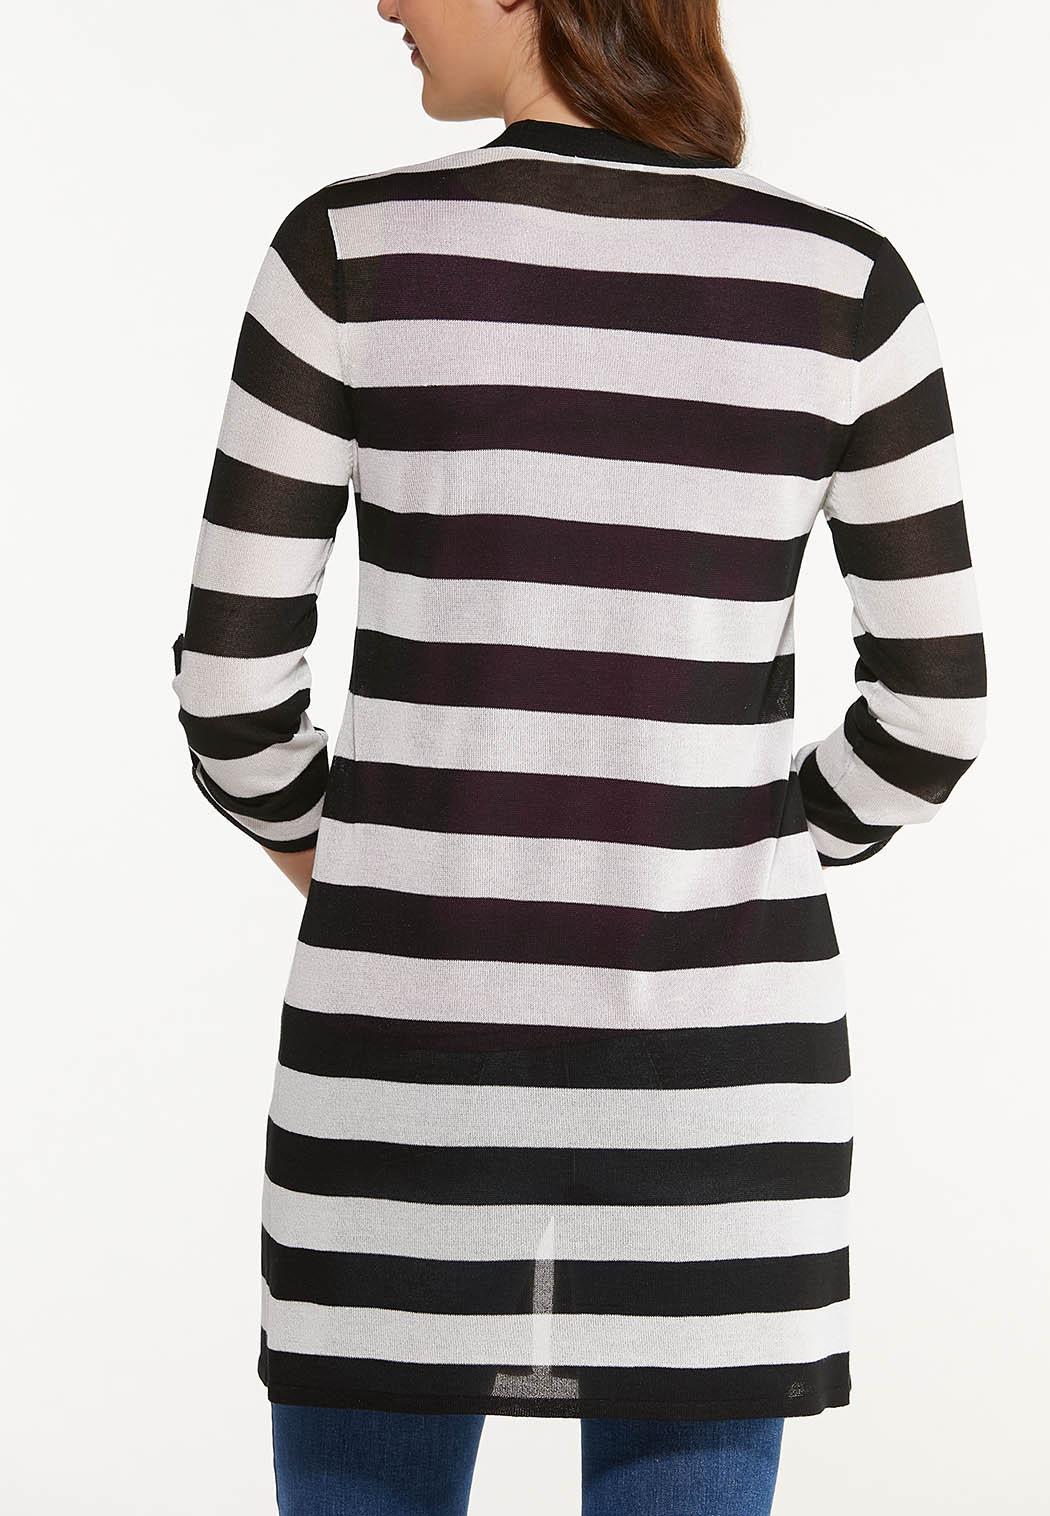 Plus Size Sheer Contrast Stripe Cardigan (Item #44512997)